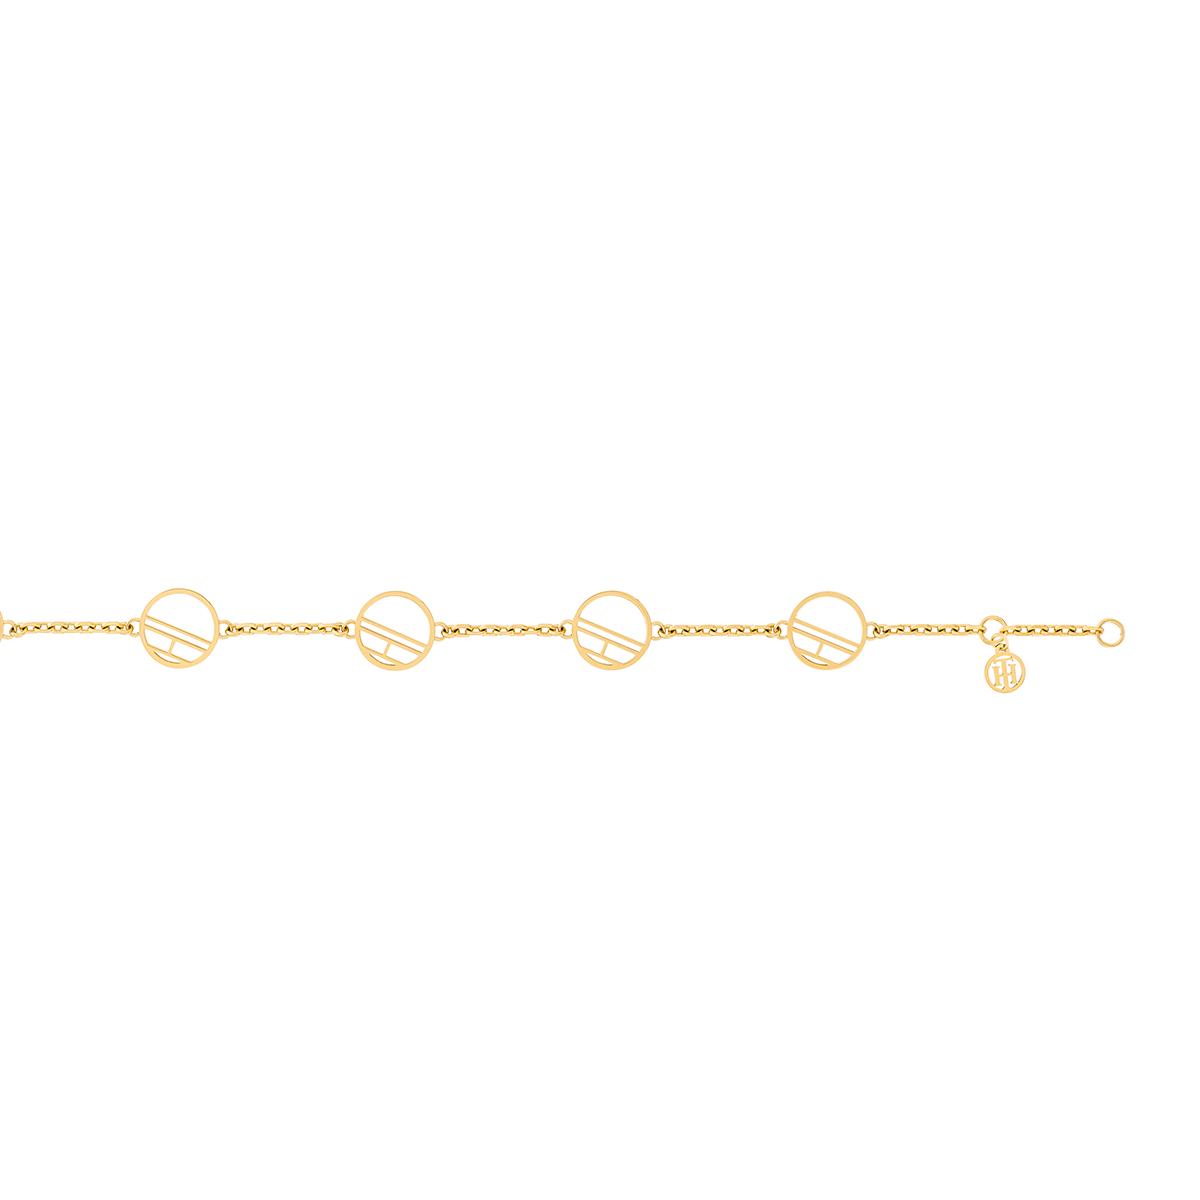 Denim bracelet TJ2780326 (Taille: 18 cm) - Tommy hilfiger - Modalova